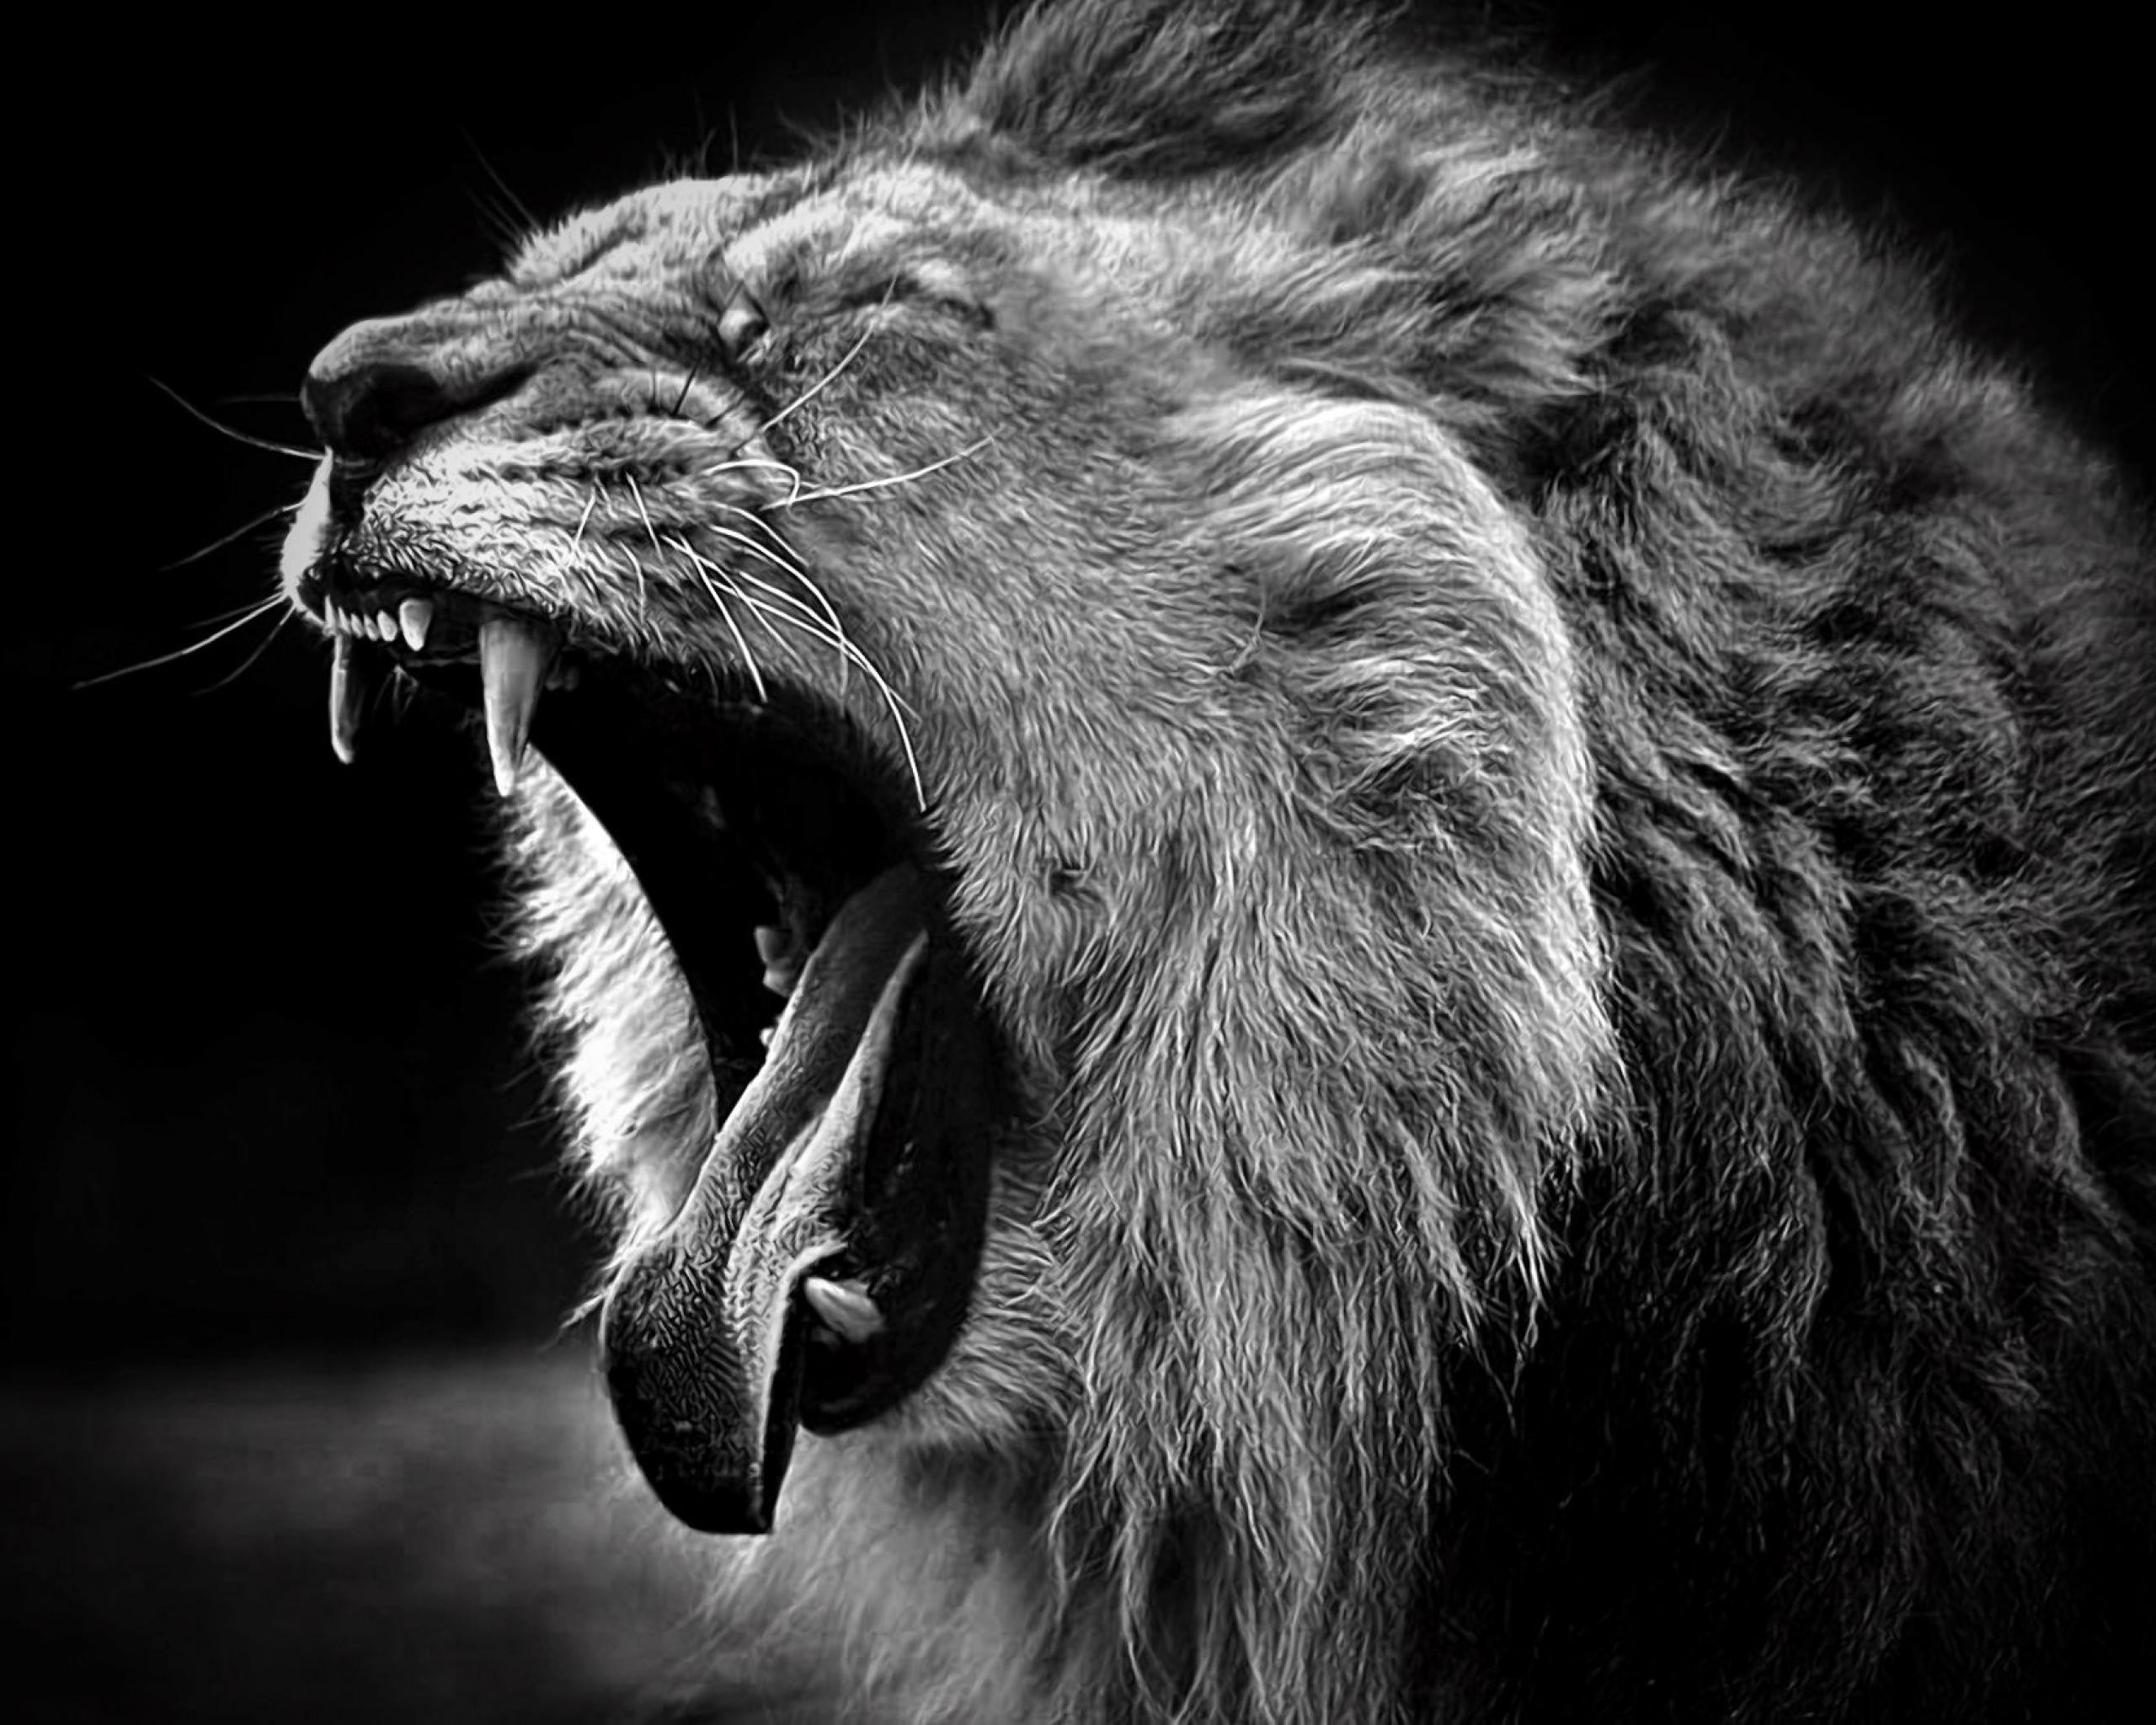 White lion wallpaper widescreen – photo#1